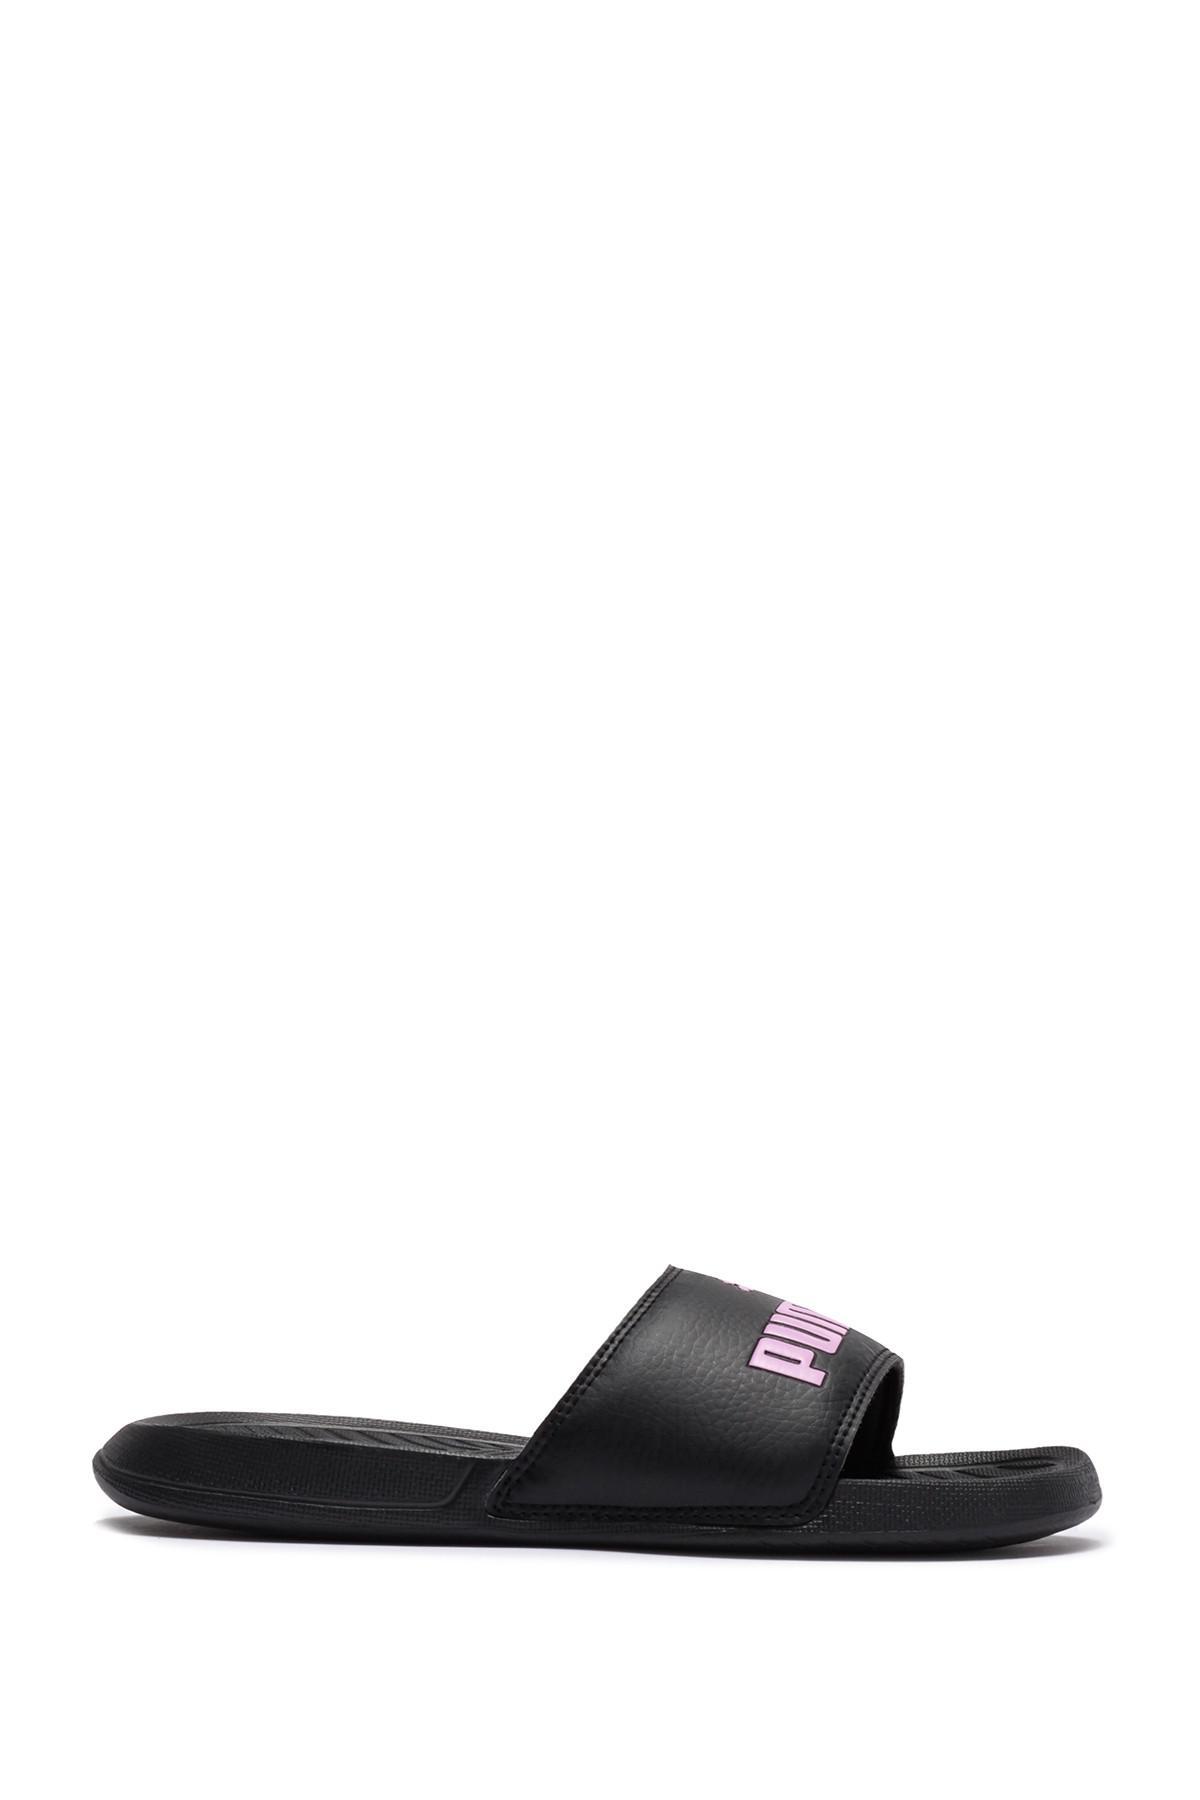 bf2376de54271 Lyst - PUMA Popcat Jr. Slide Sandal in Black for Men